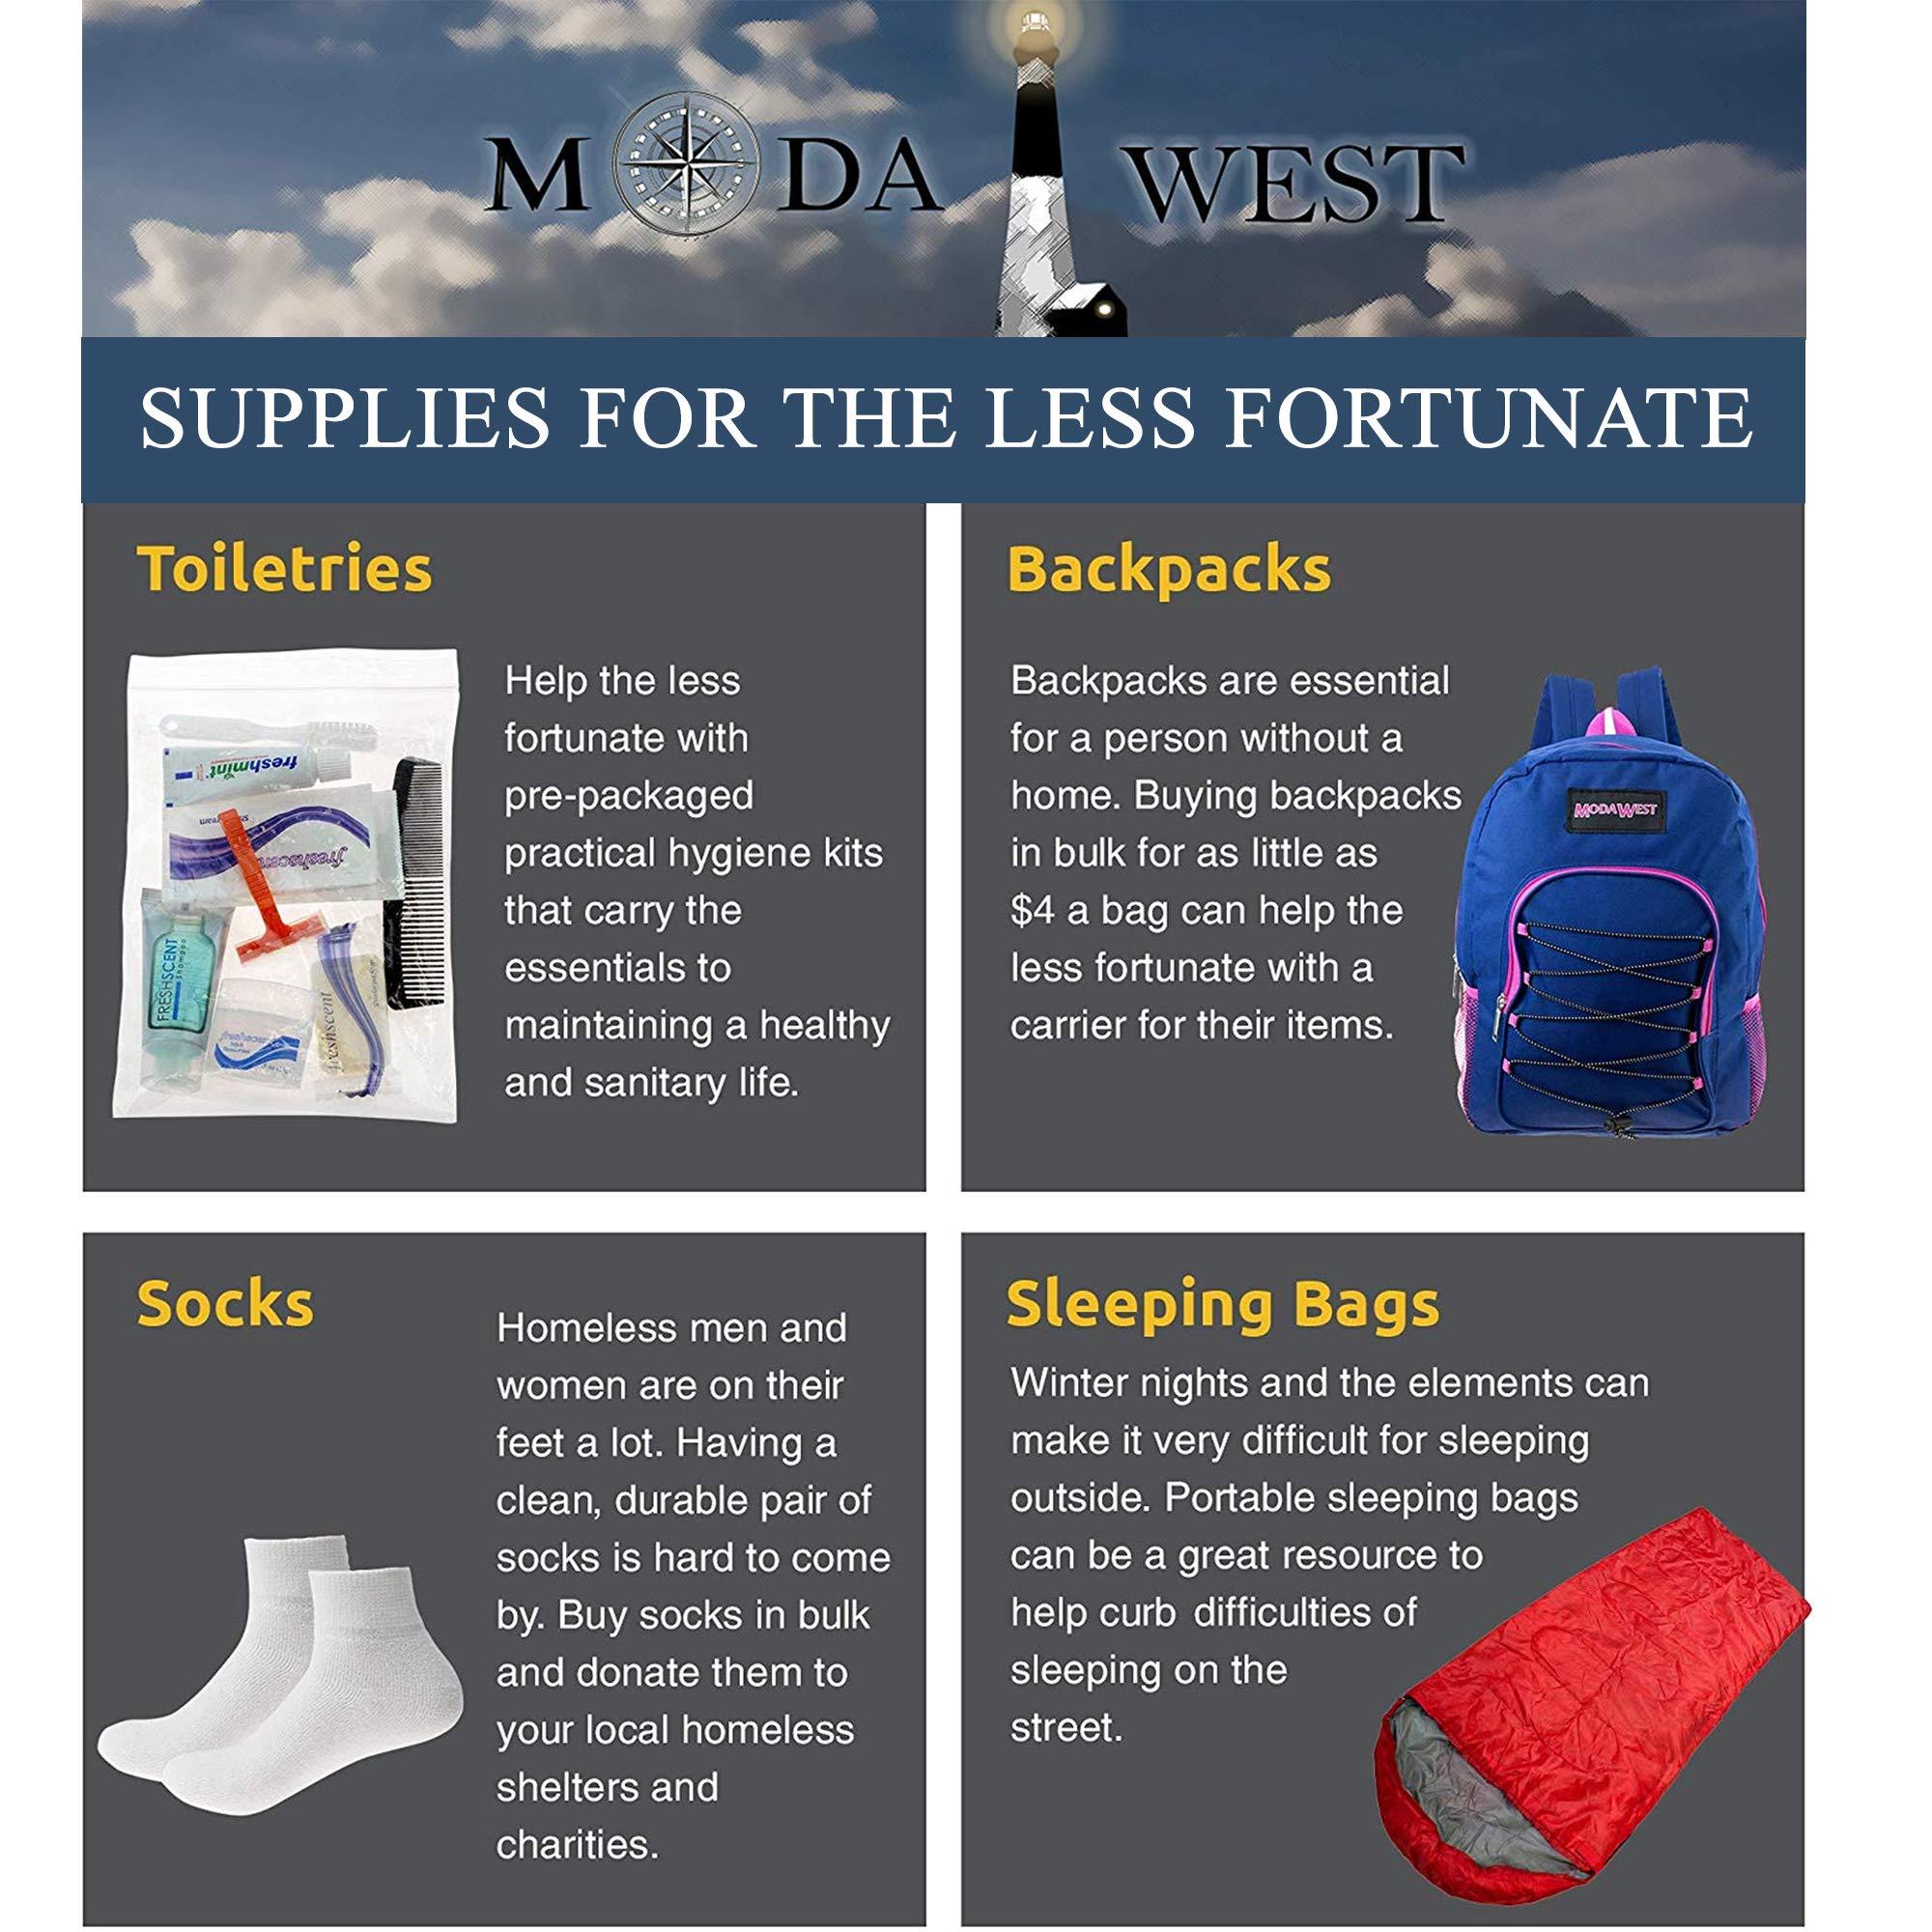 48 Kits - Bulk Case of Wholesale Deluxe 15 Piece Hygiene & Toiletry Kit for Men, Women, Travel, Charity by Moda West (Image #9)